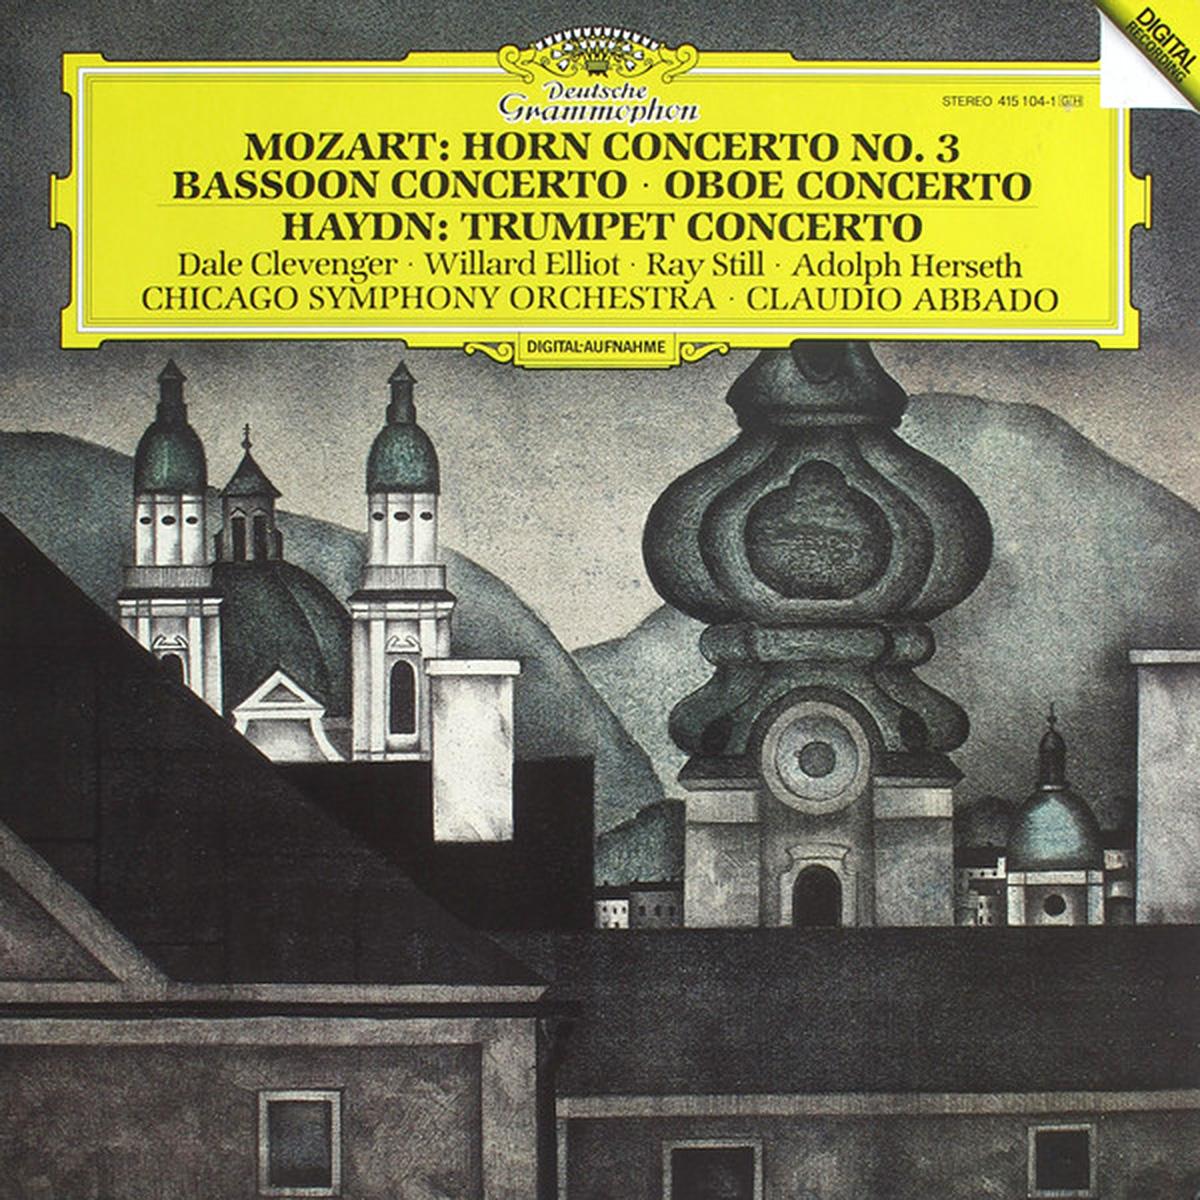 DGG 415104 Mozart Haydn Concertos Vents DGG Digital Aufnahme